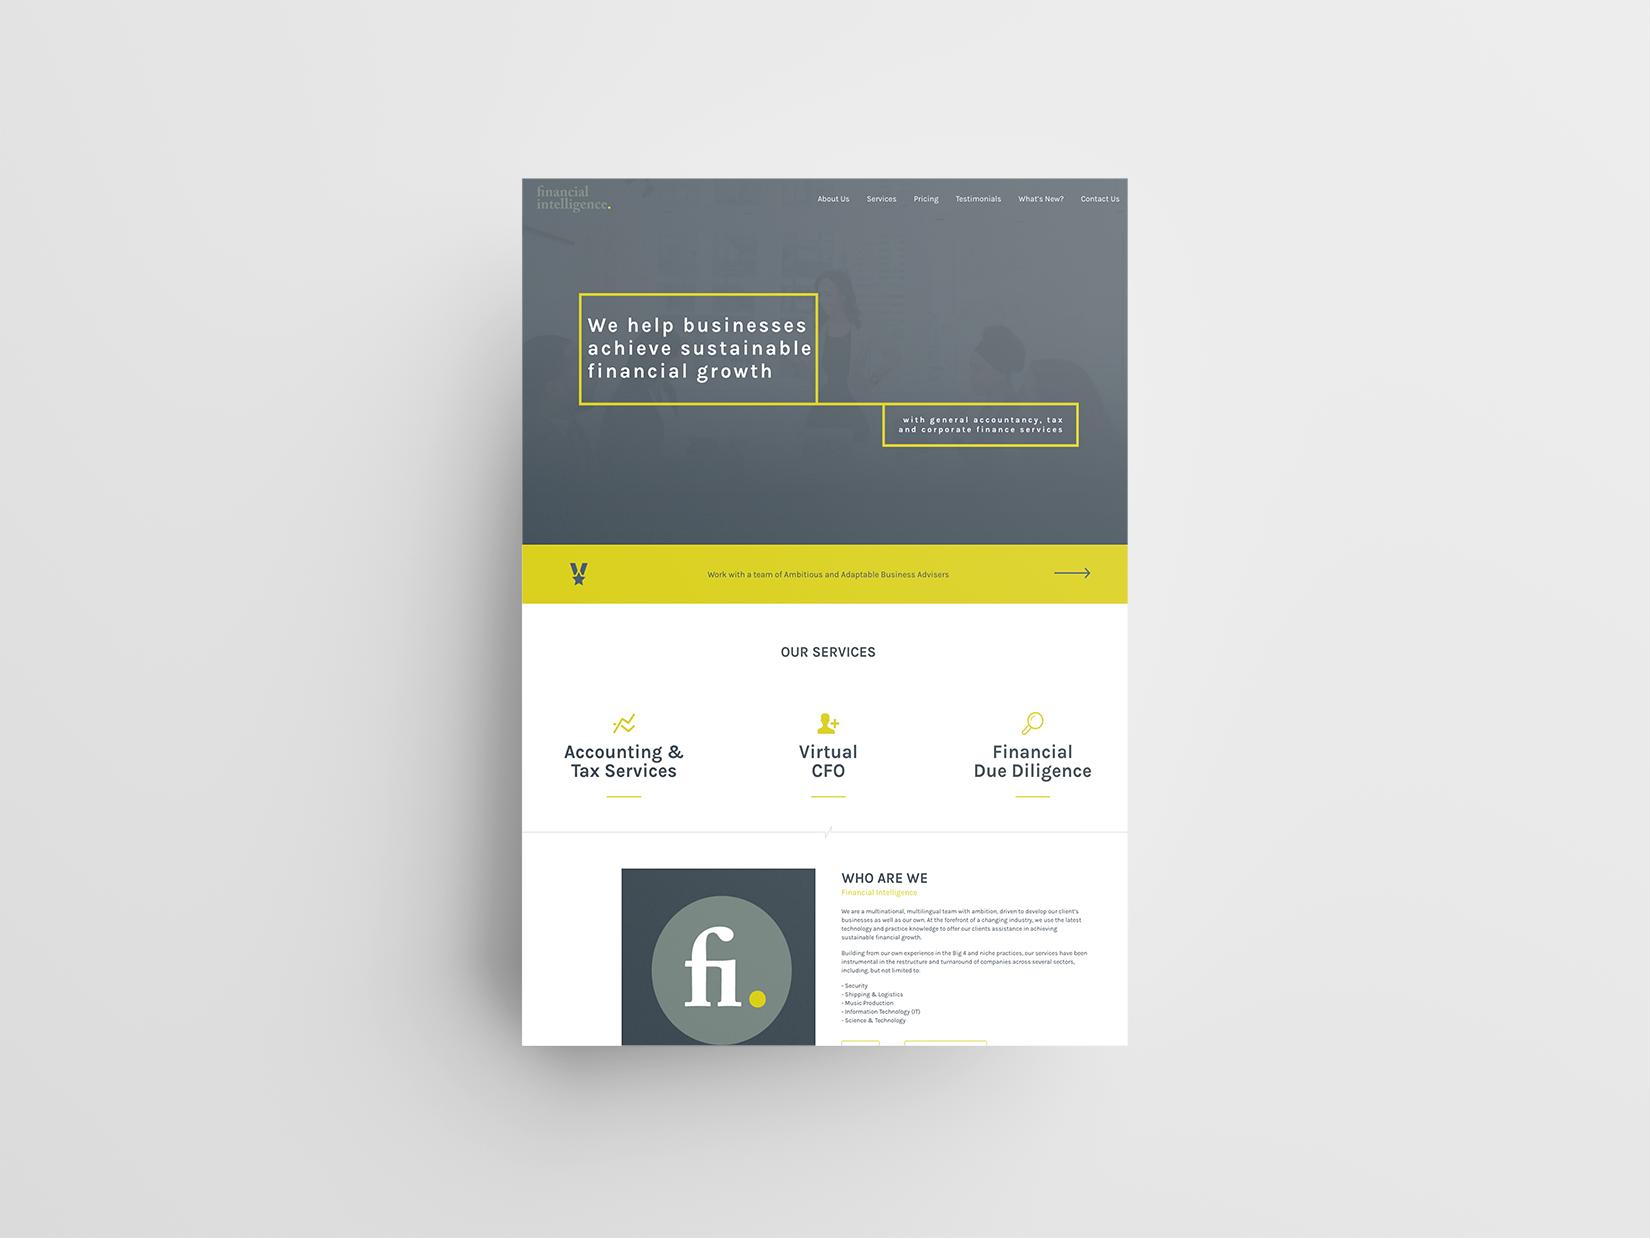 Website Design Digital Agency Case Study - Financial Intelligence